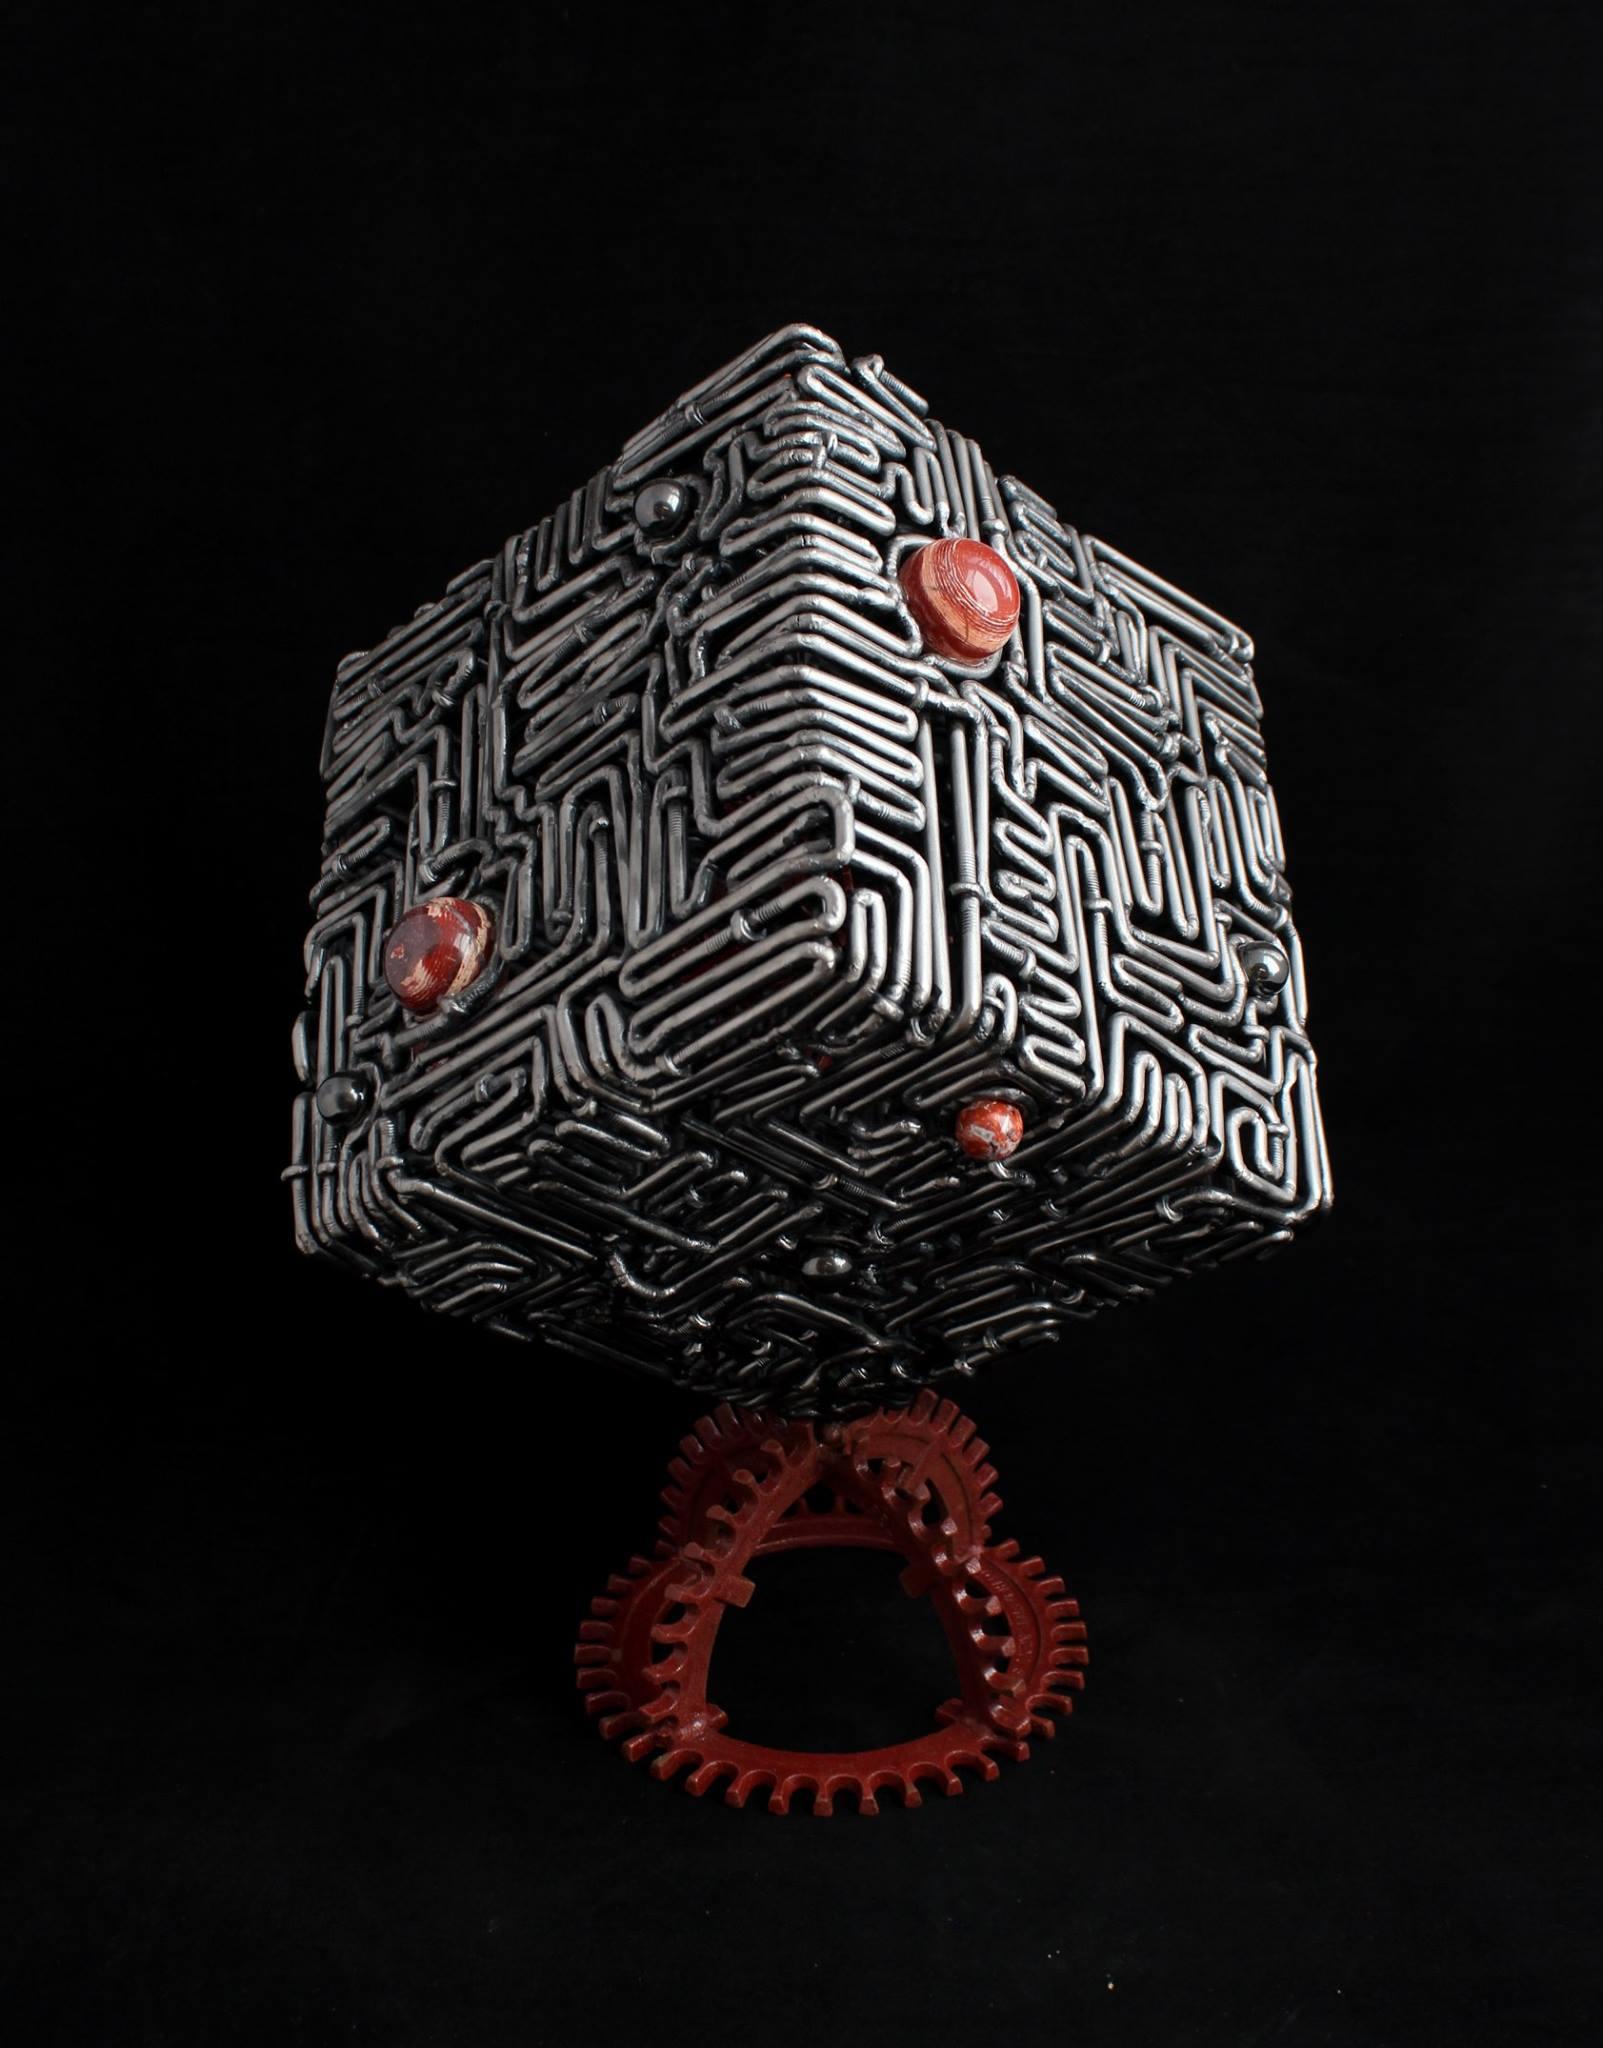 metal art - handmade sculptures - steel maze cube sculpture - mccallister sculpture - scottsdale art